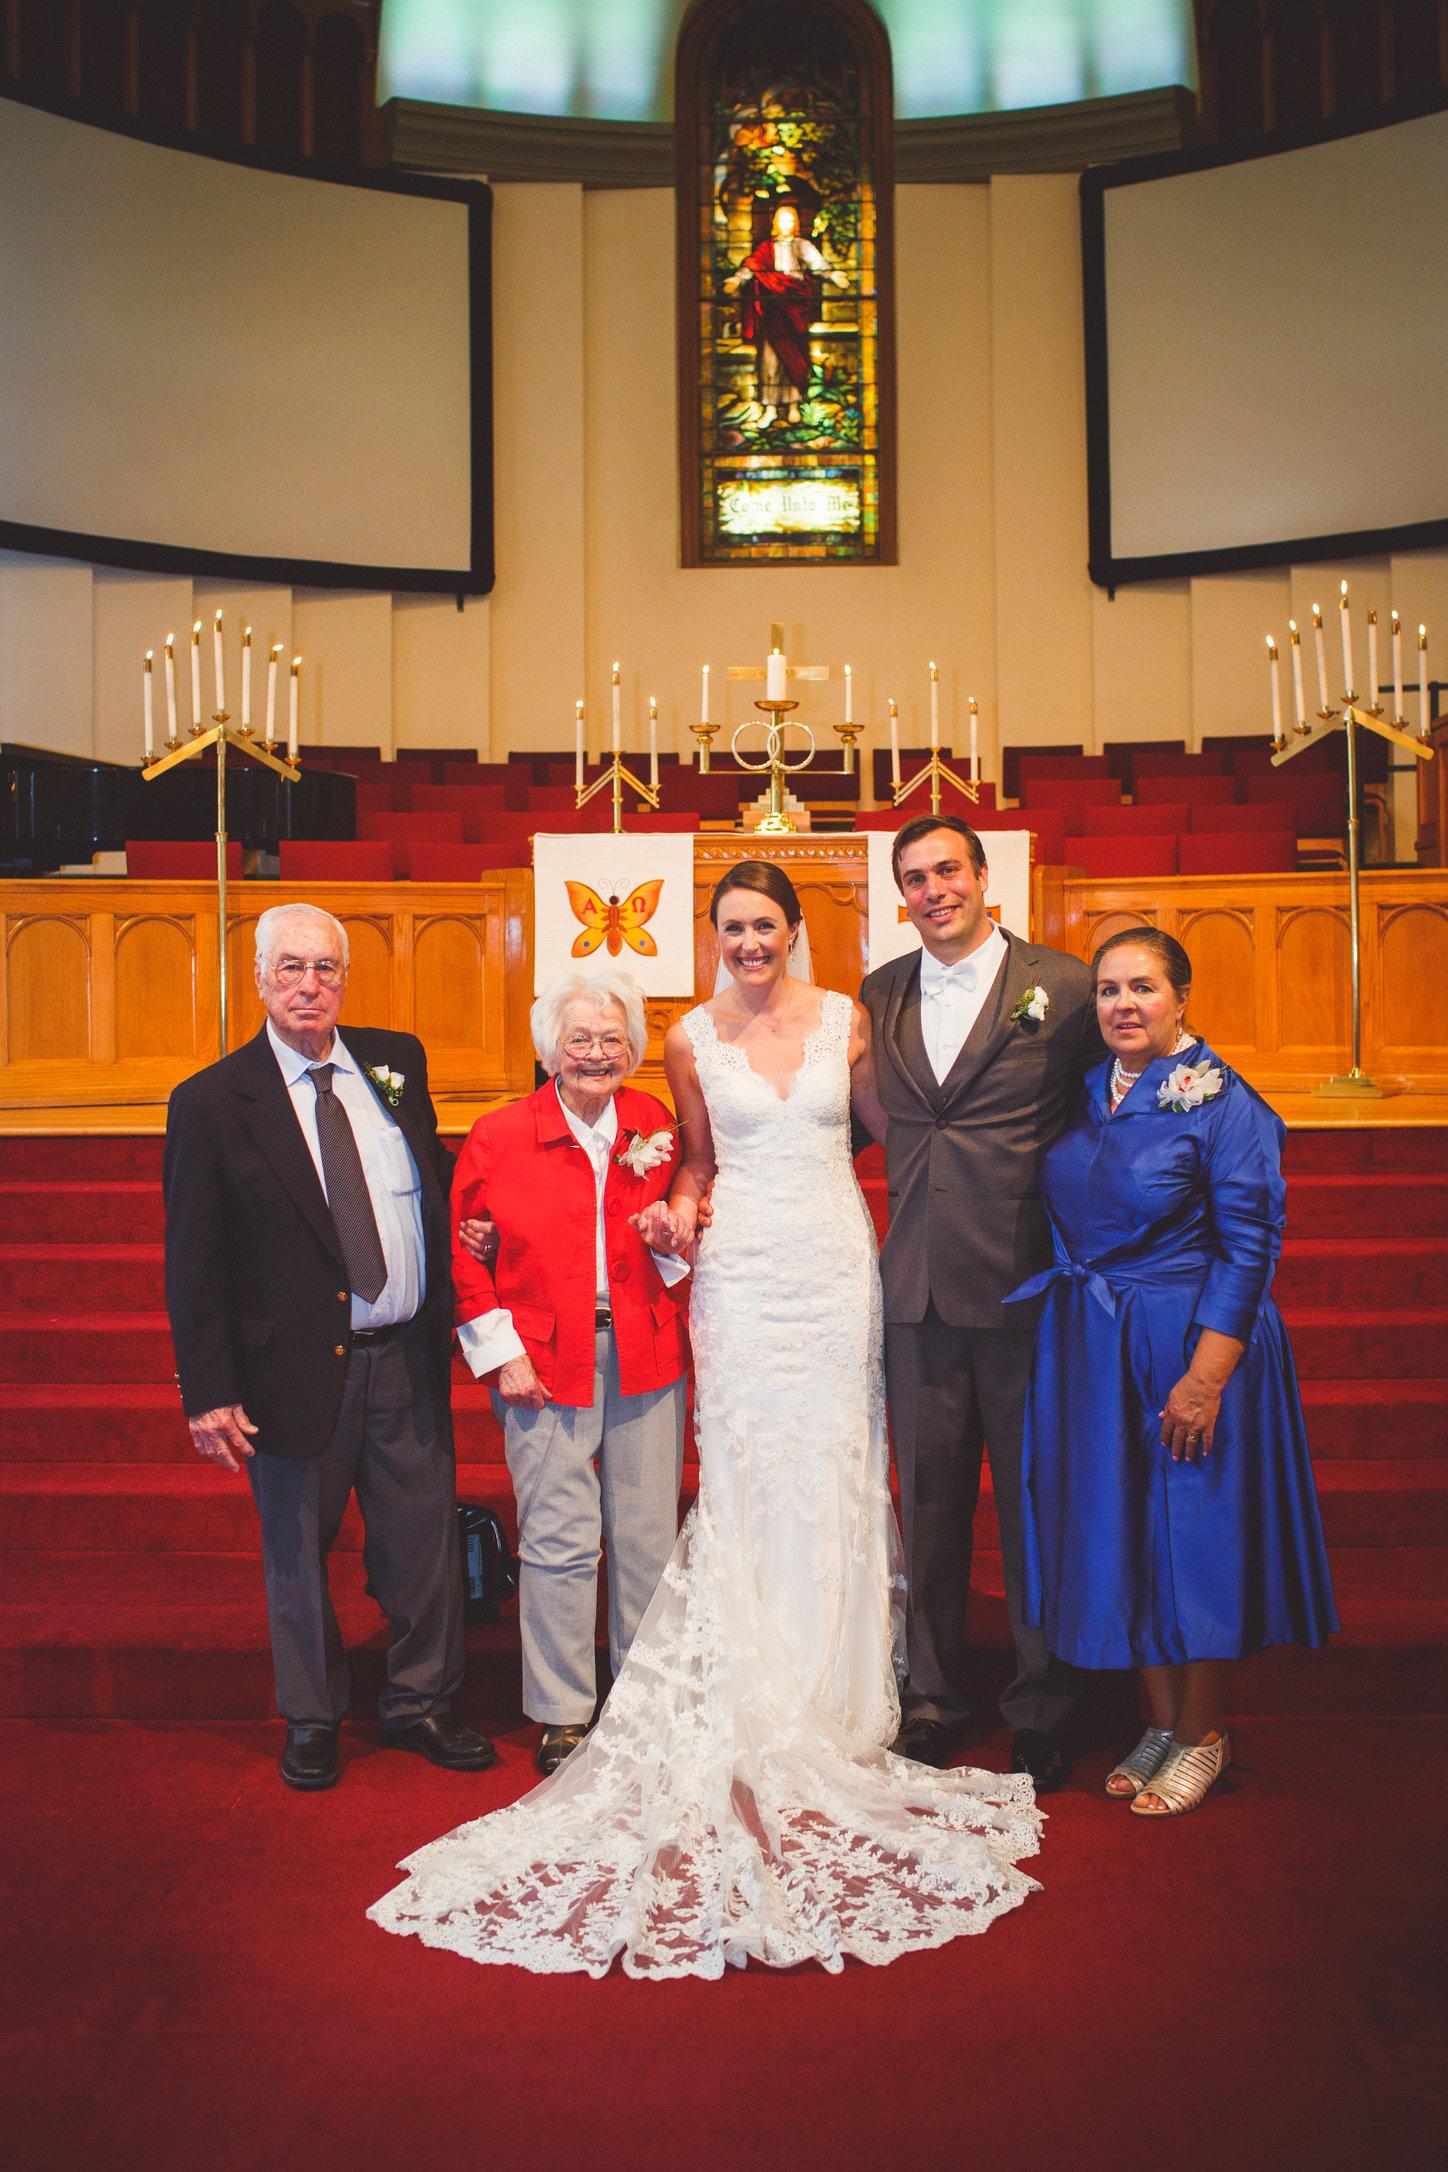 SandC-wedding-277.jpg